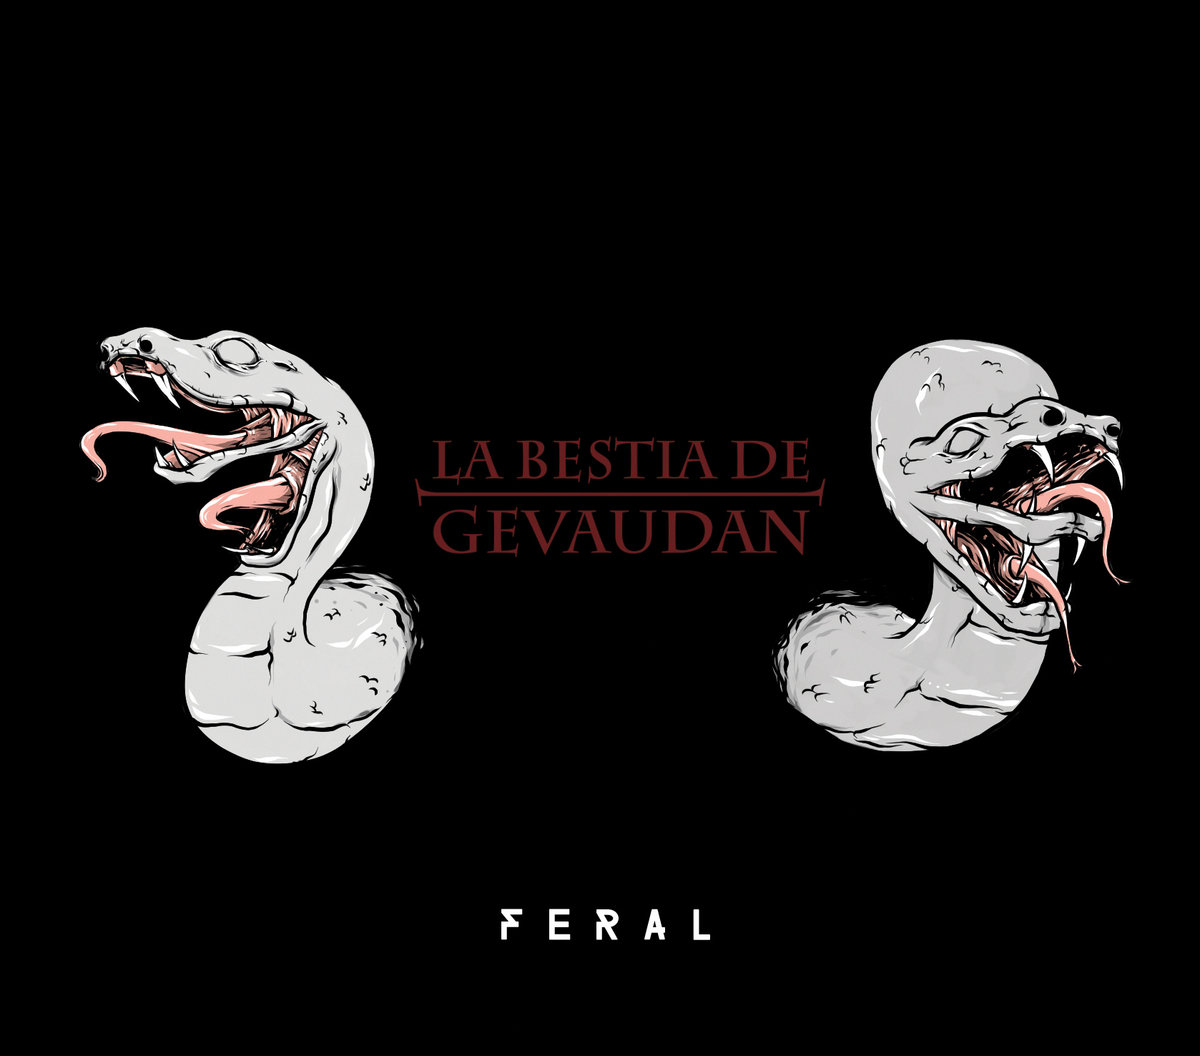 La Bestia de Gevaudan: Feral (2015)